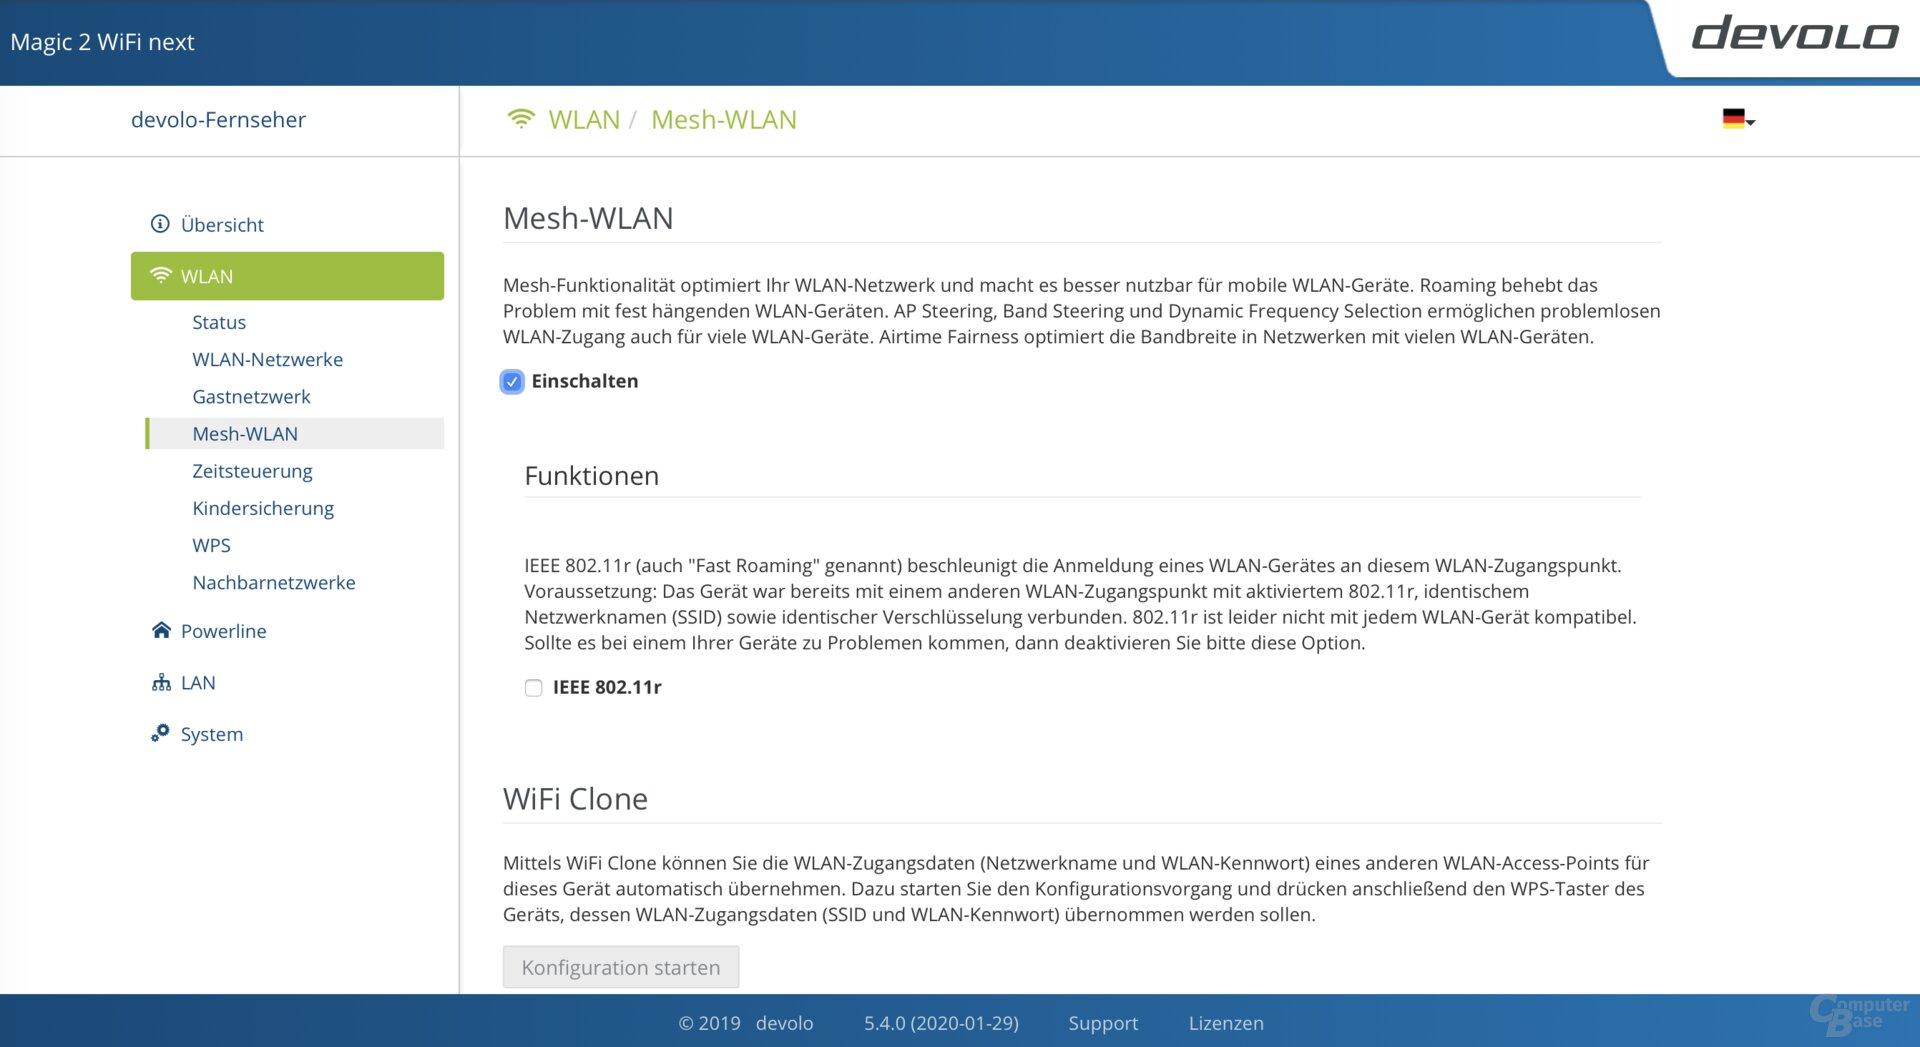 Benutzeroberfläche des Magic-2-WiFi-next-Adapters